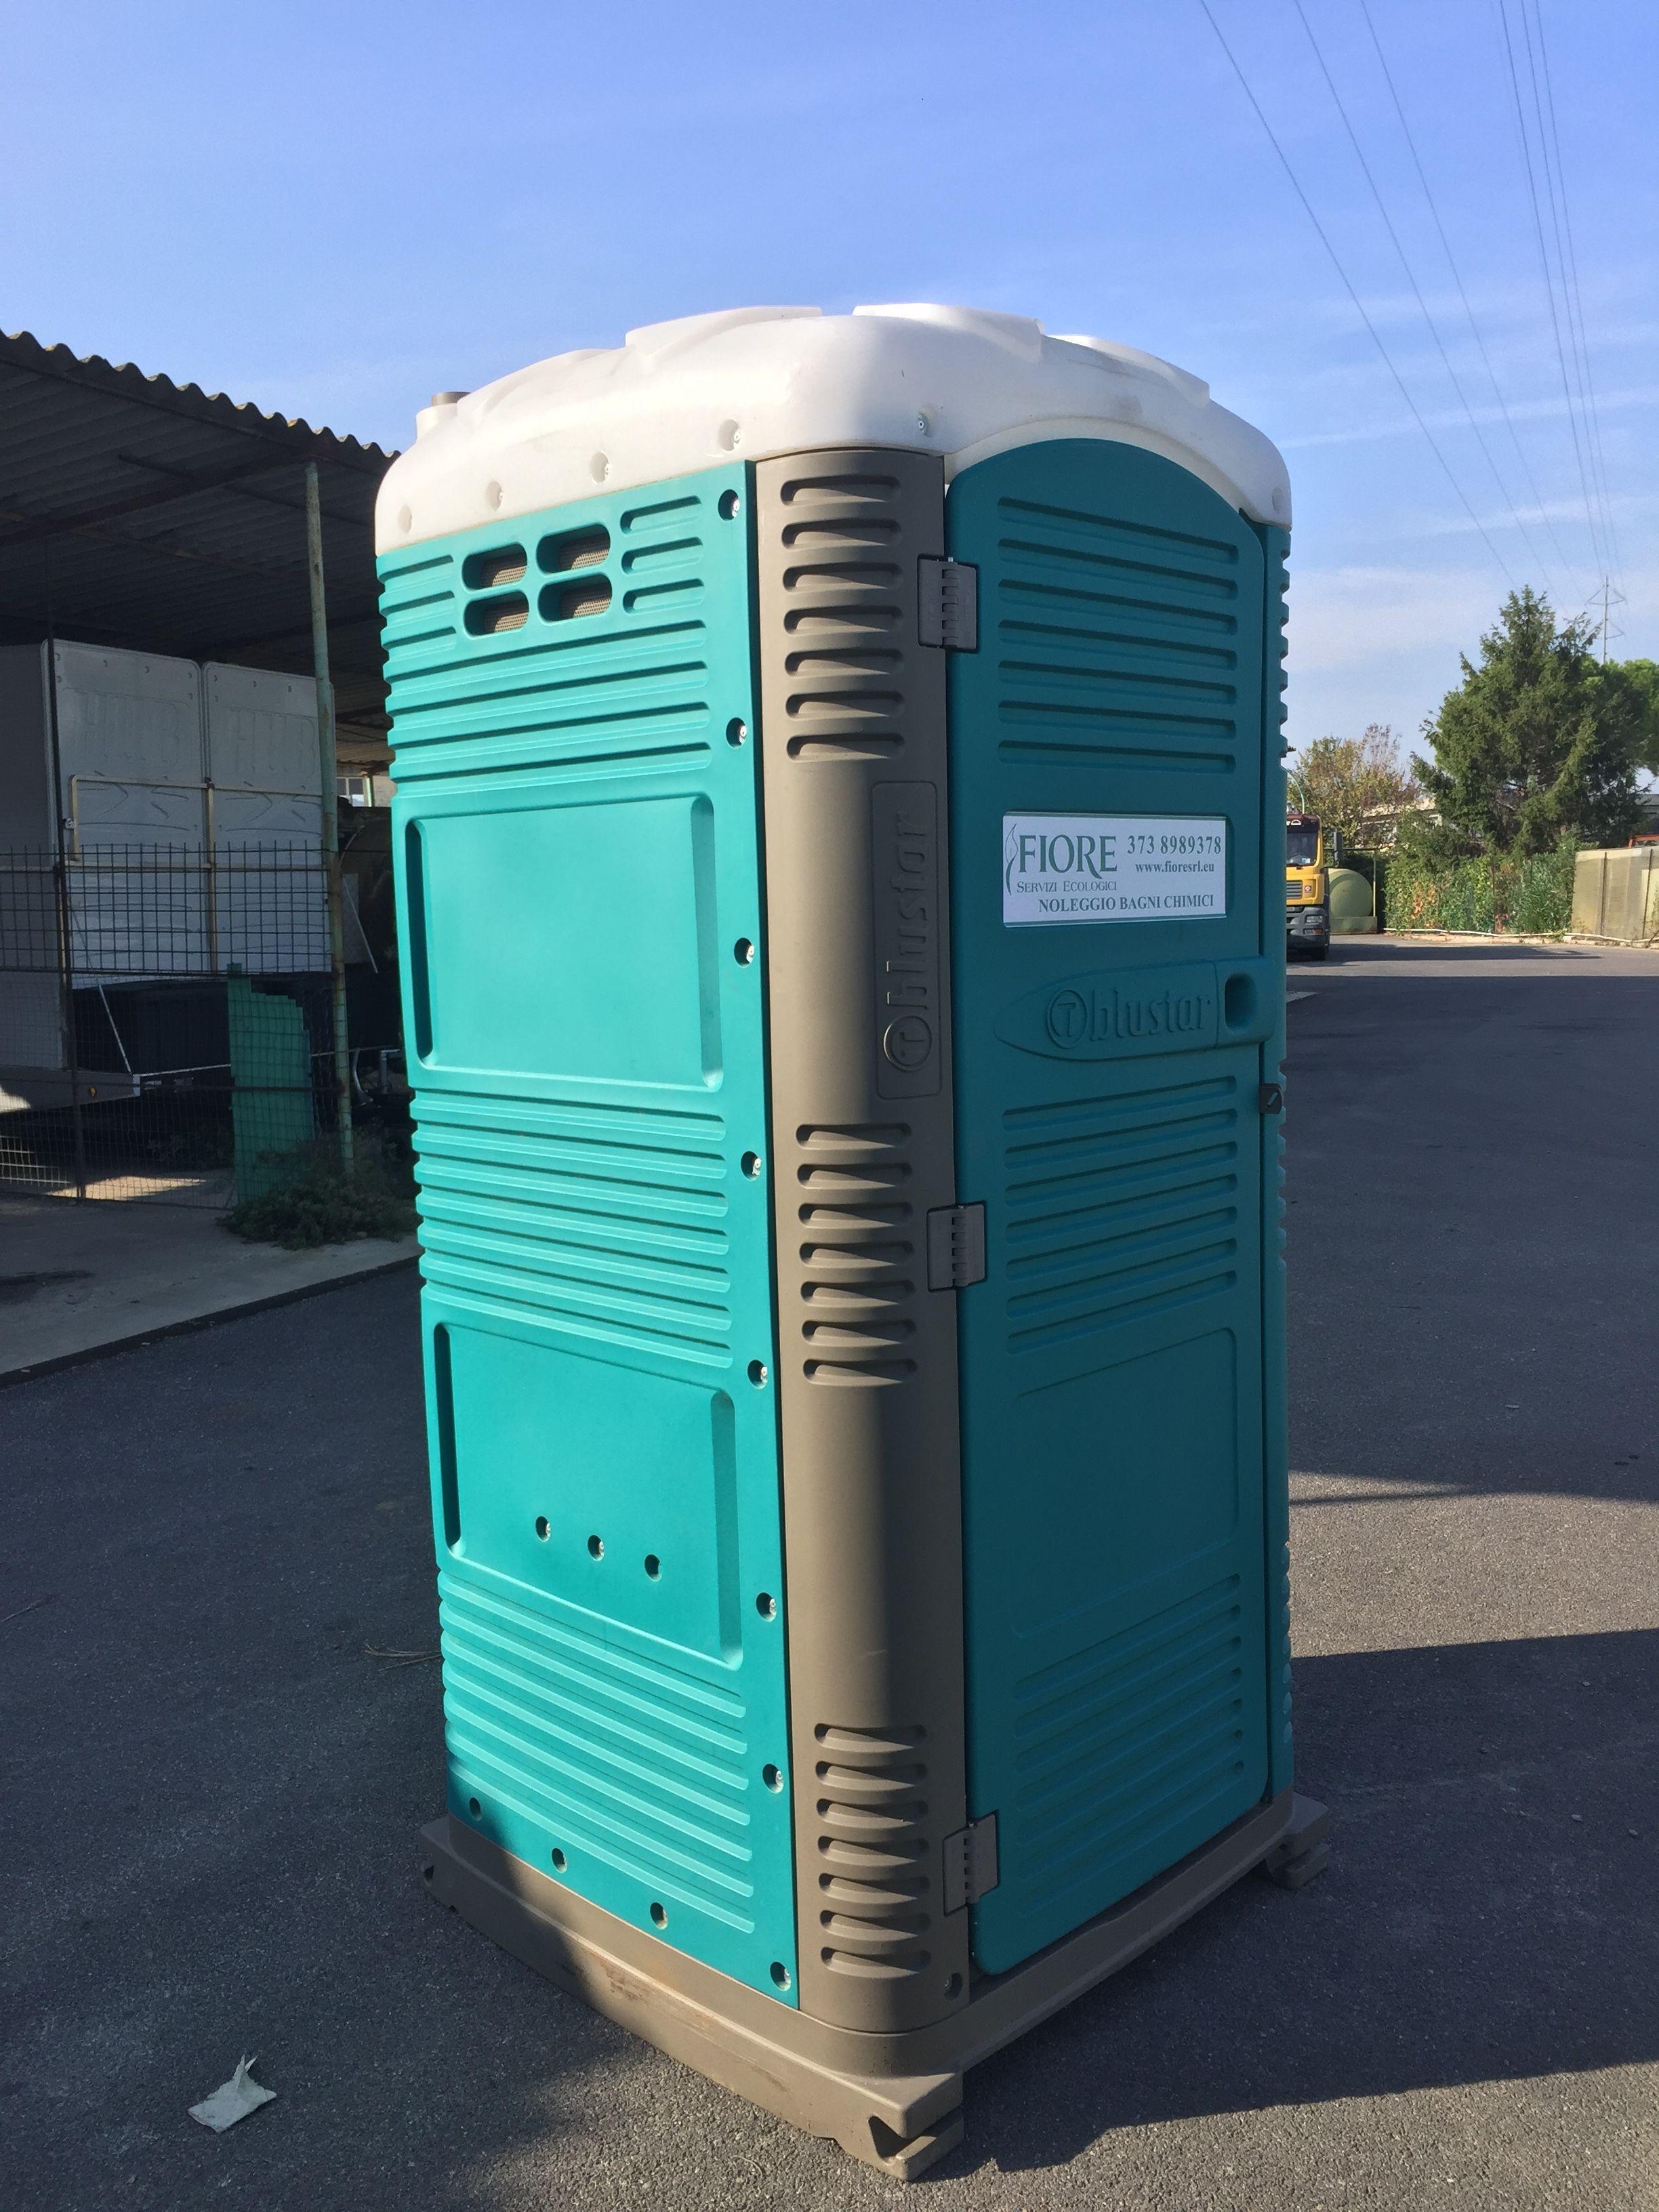 Myblok Portable Toilet Portable Restrooms Locker Storage